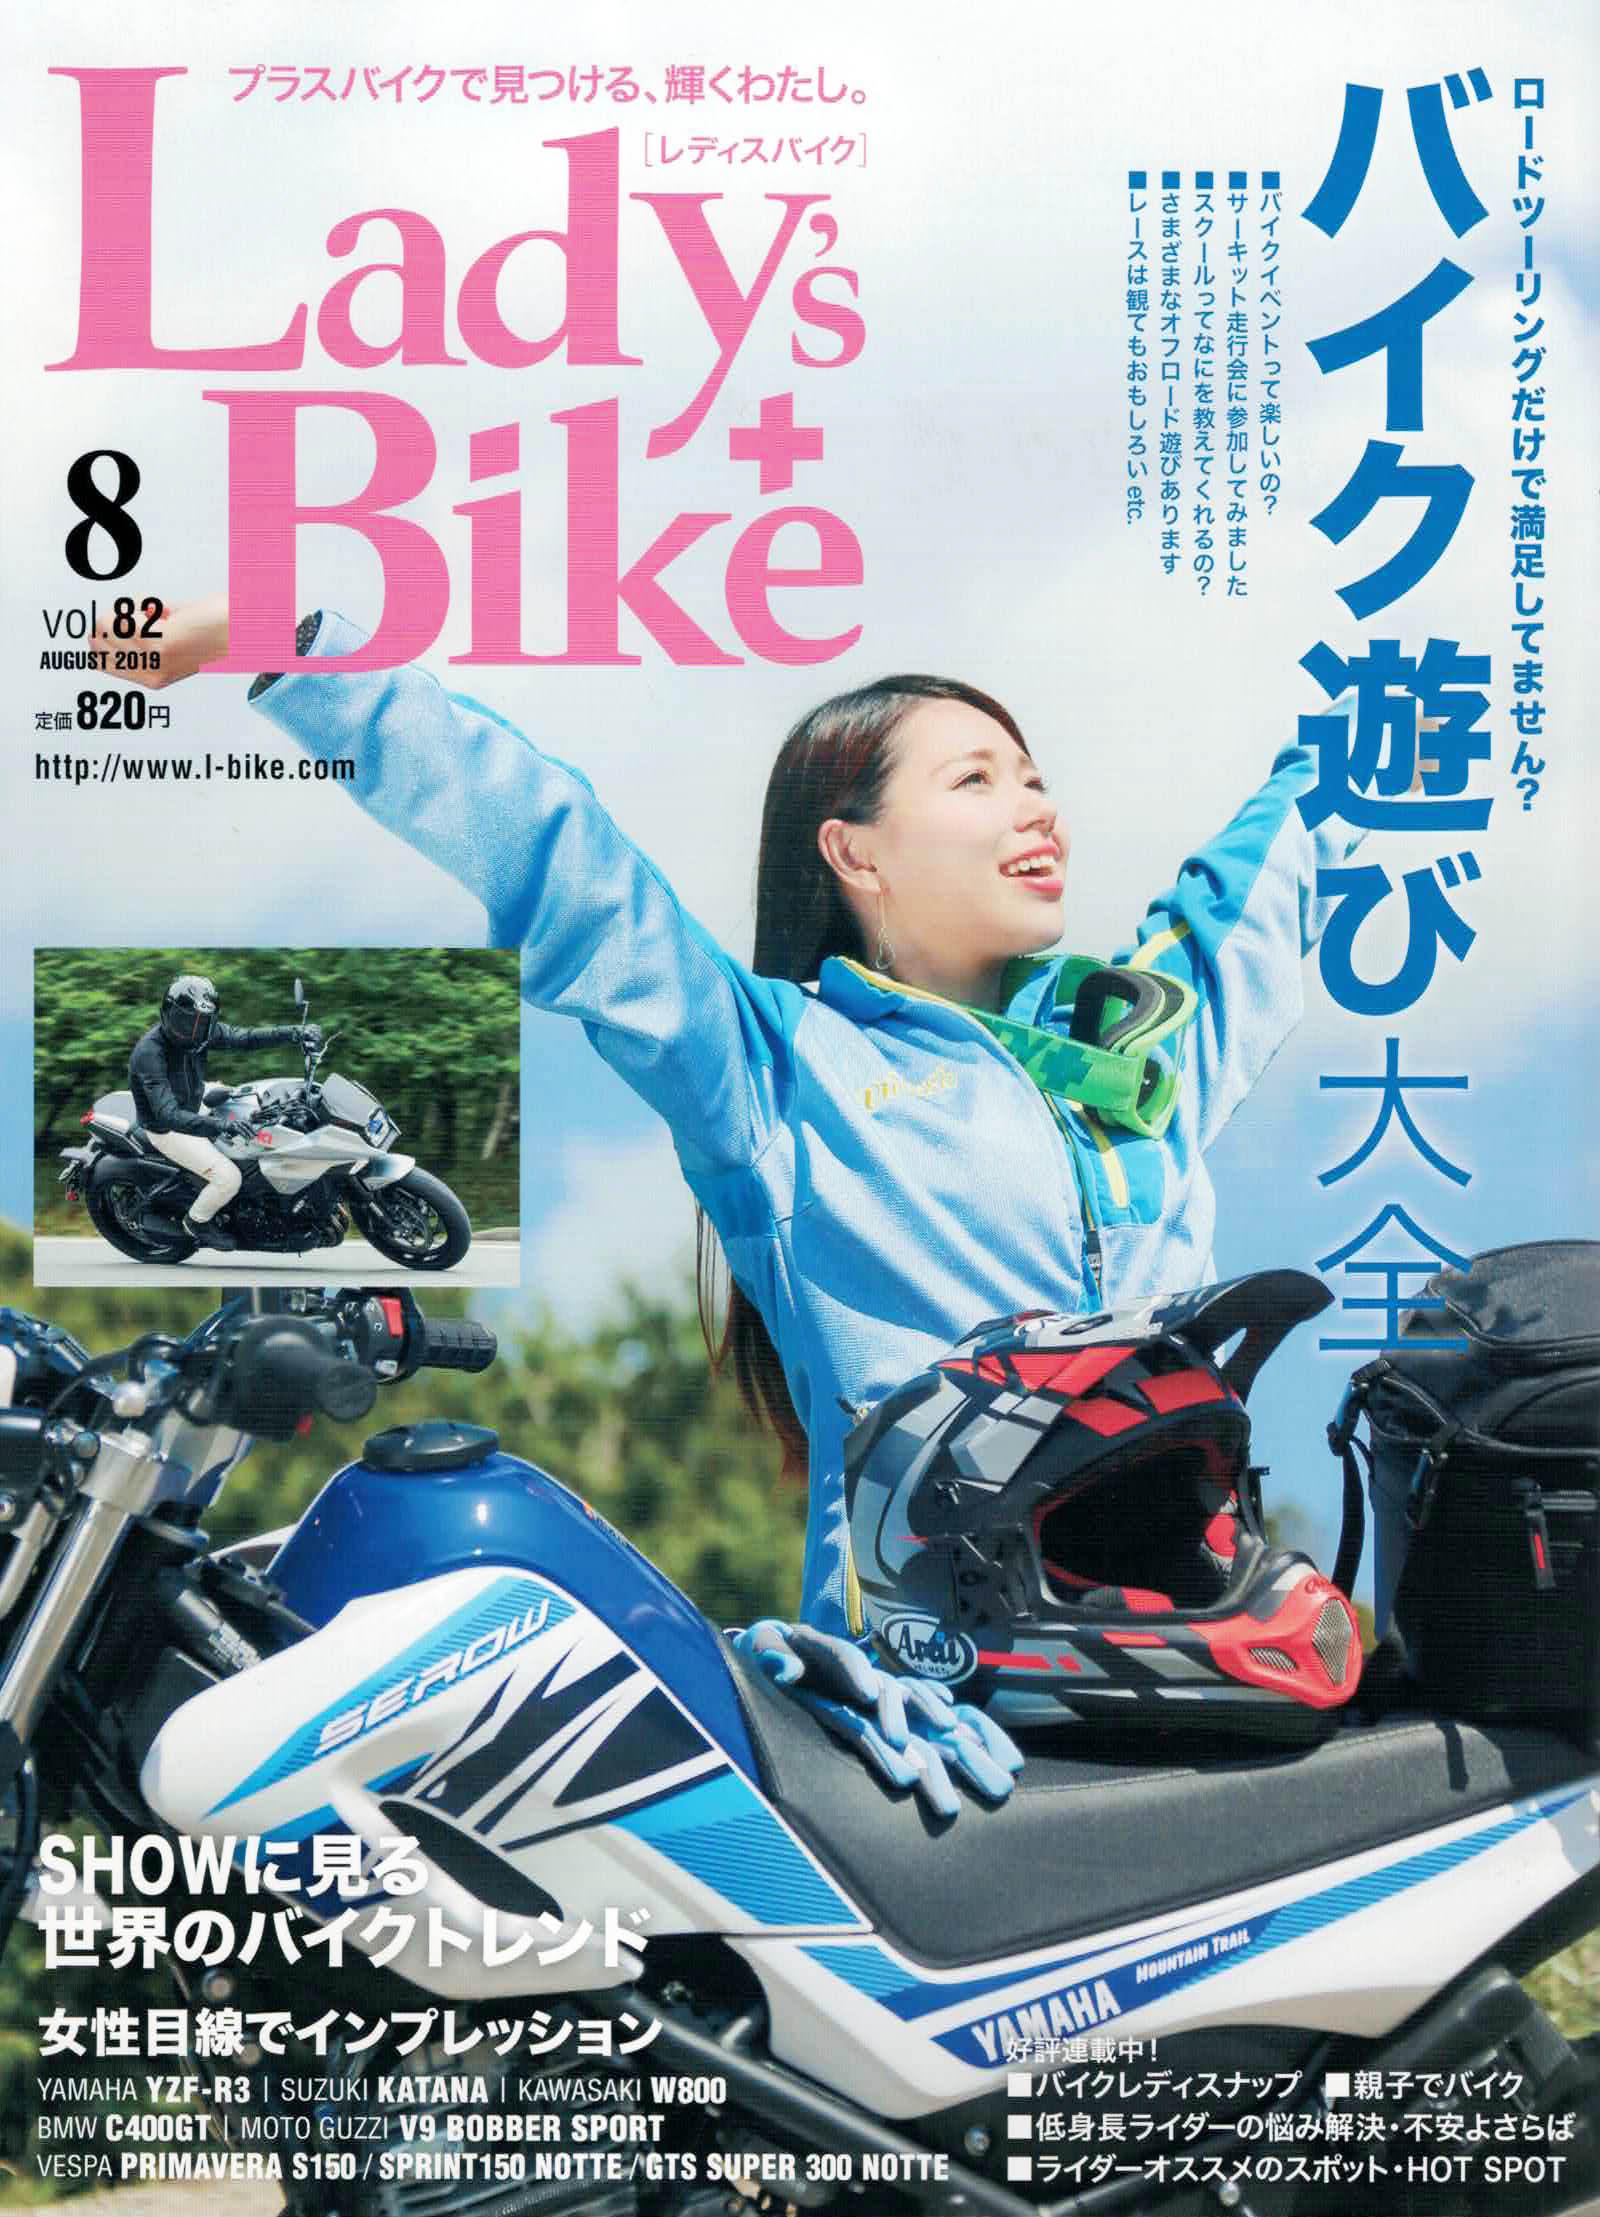 【Lady's Bike8月号掲載】PANDO MOTO